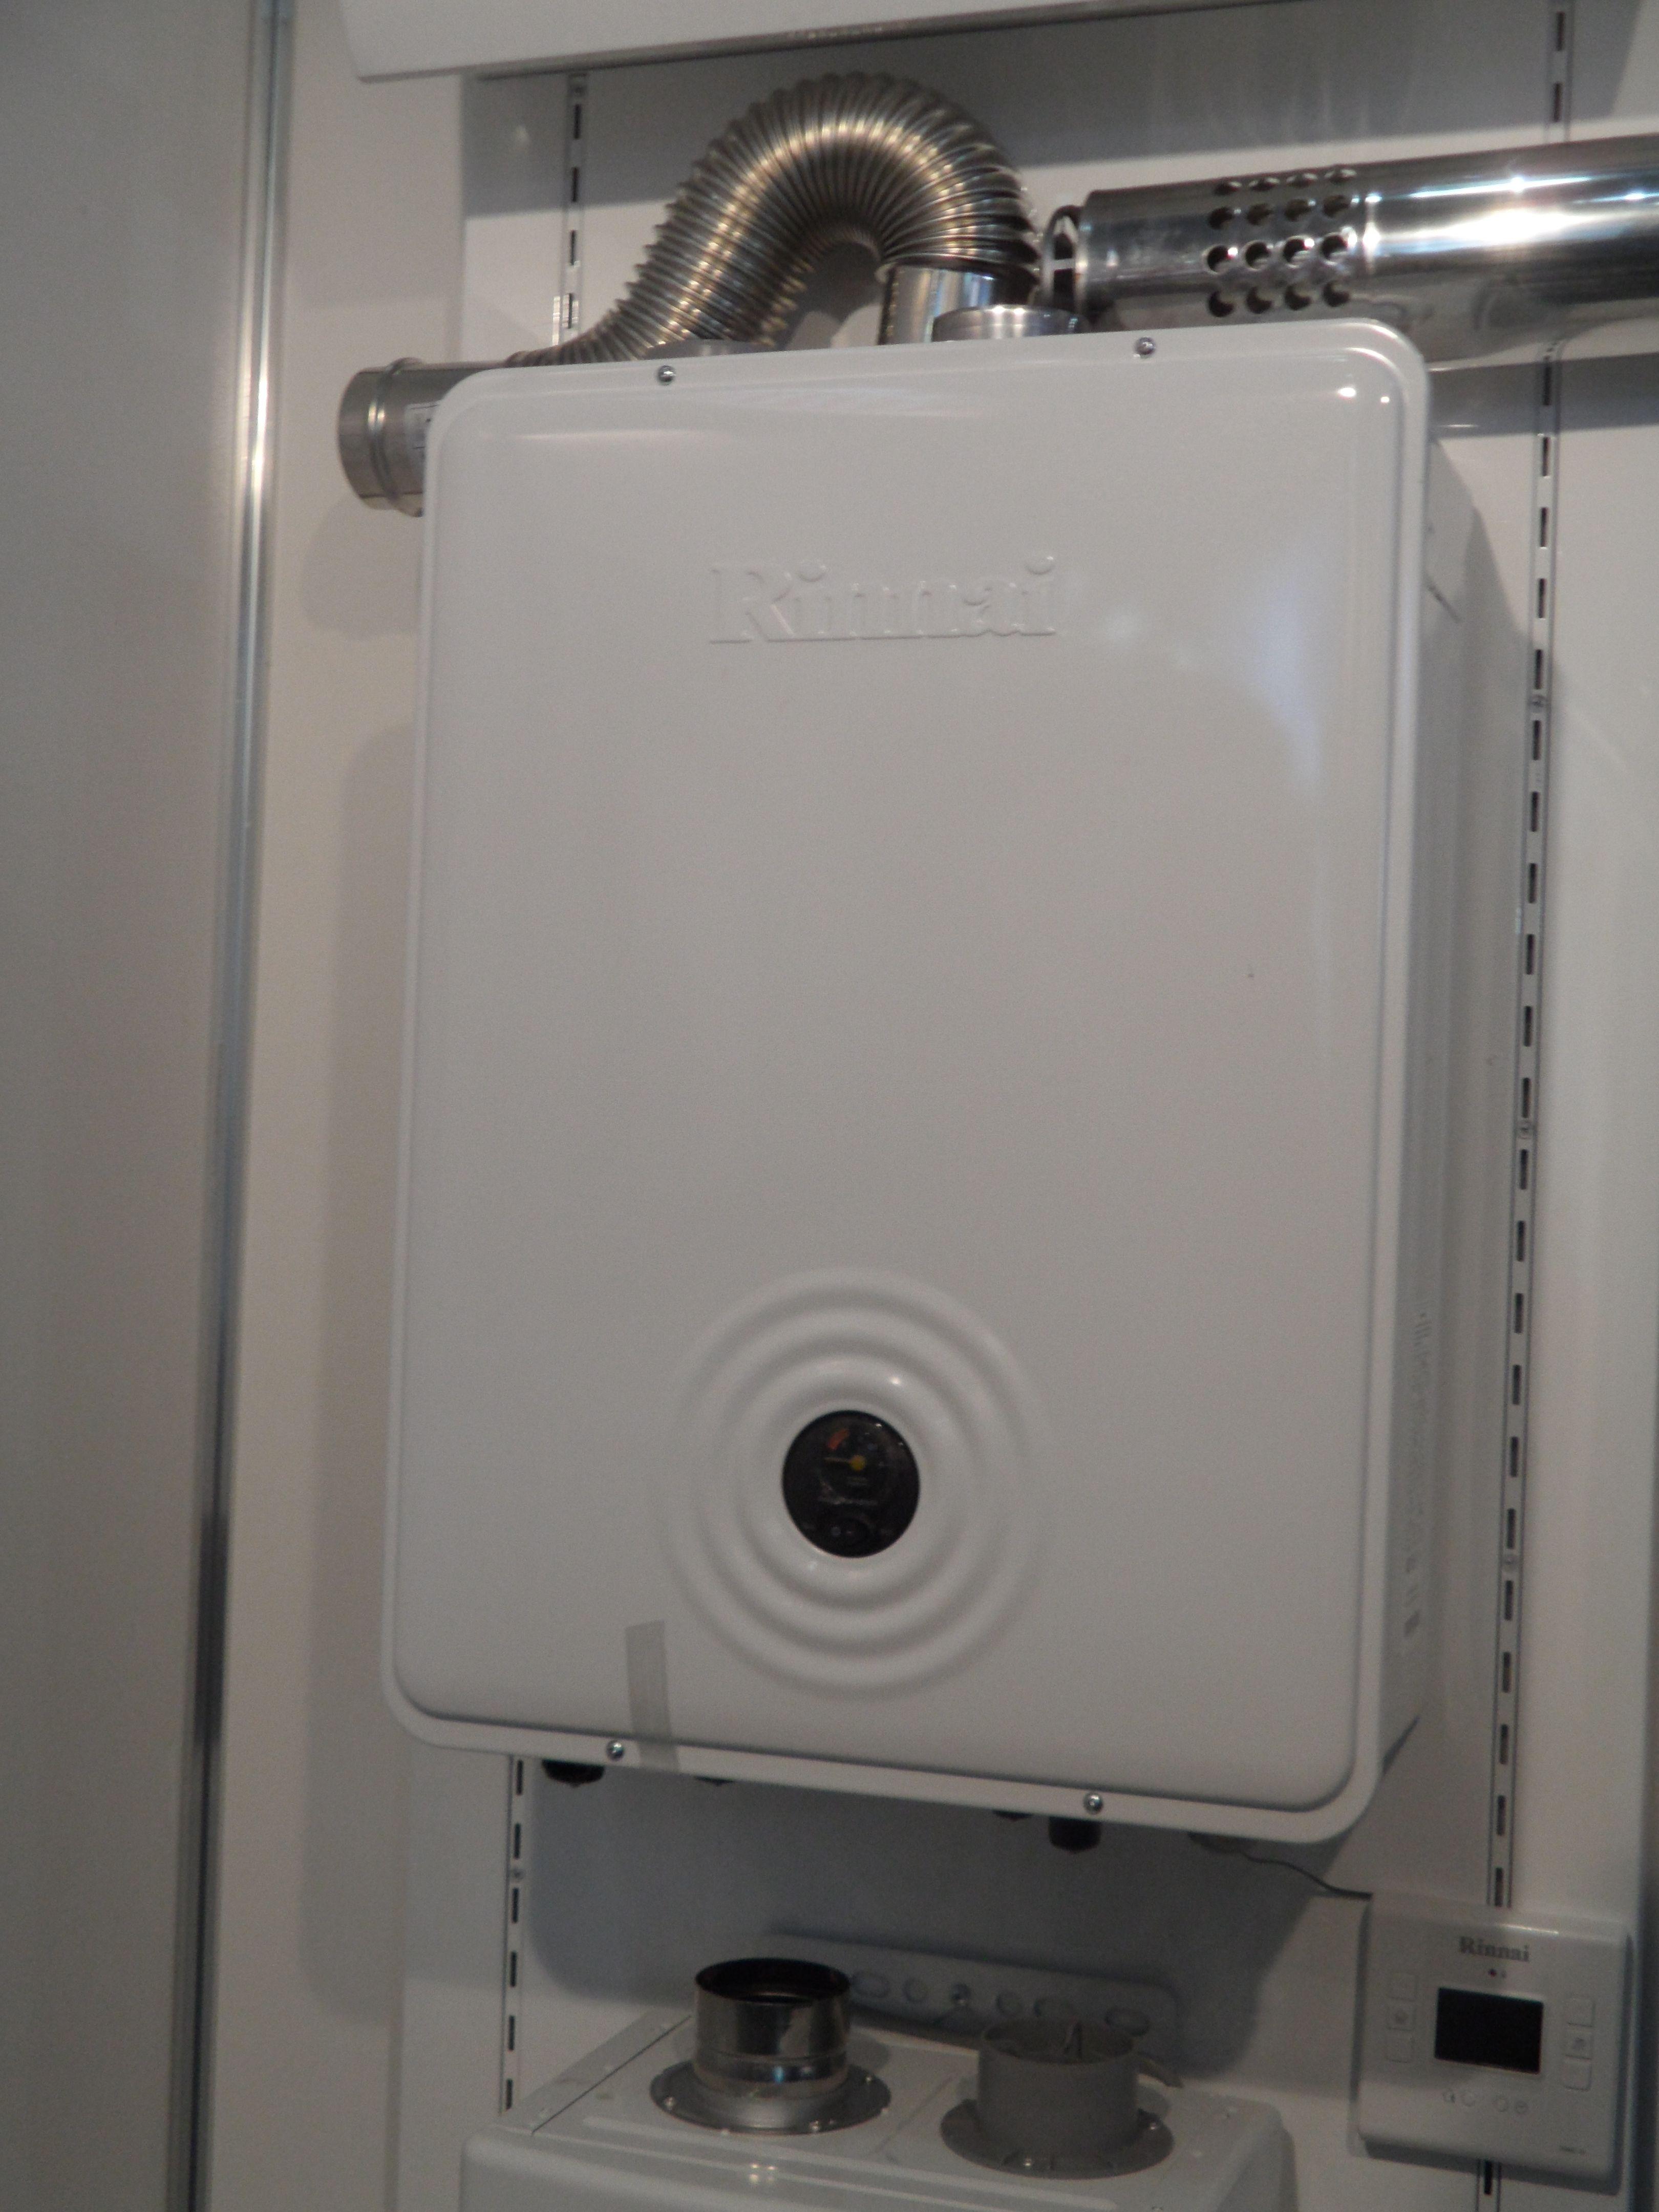 chaudiere a condensation sortie cheminee demande de devis antibes entreprise rdxrx. Black Bedroom Furniture Sets. Home Design Ideas